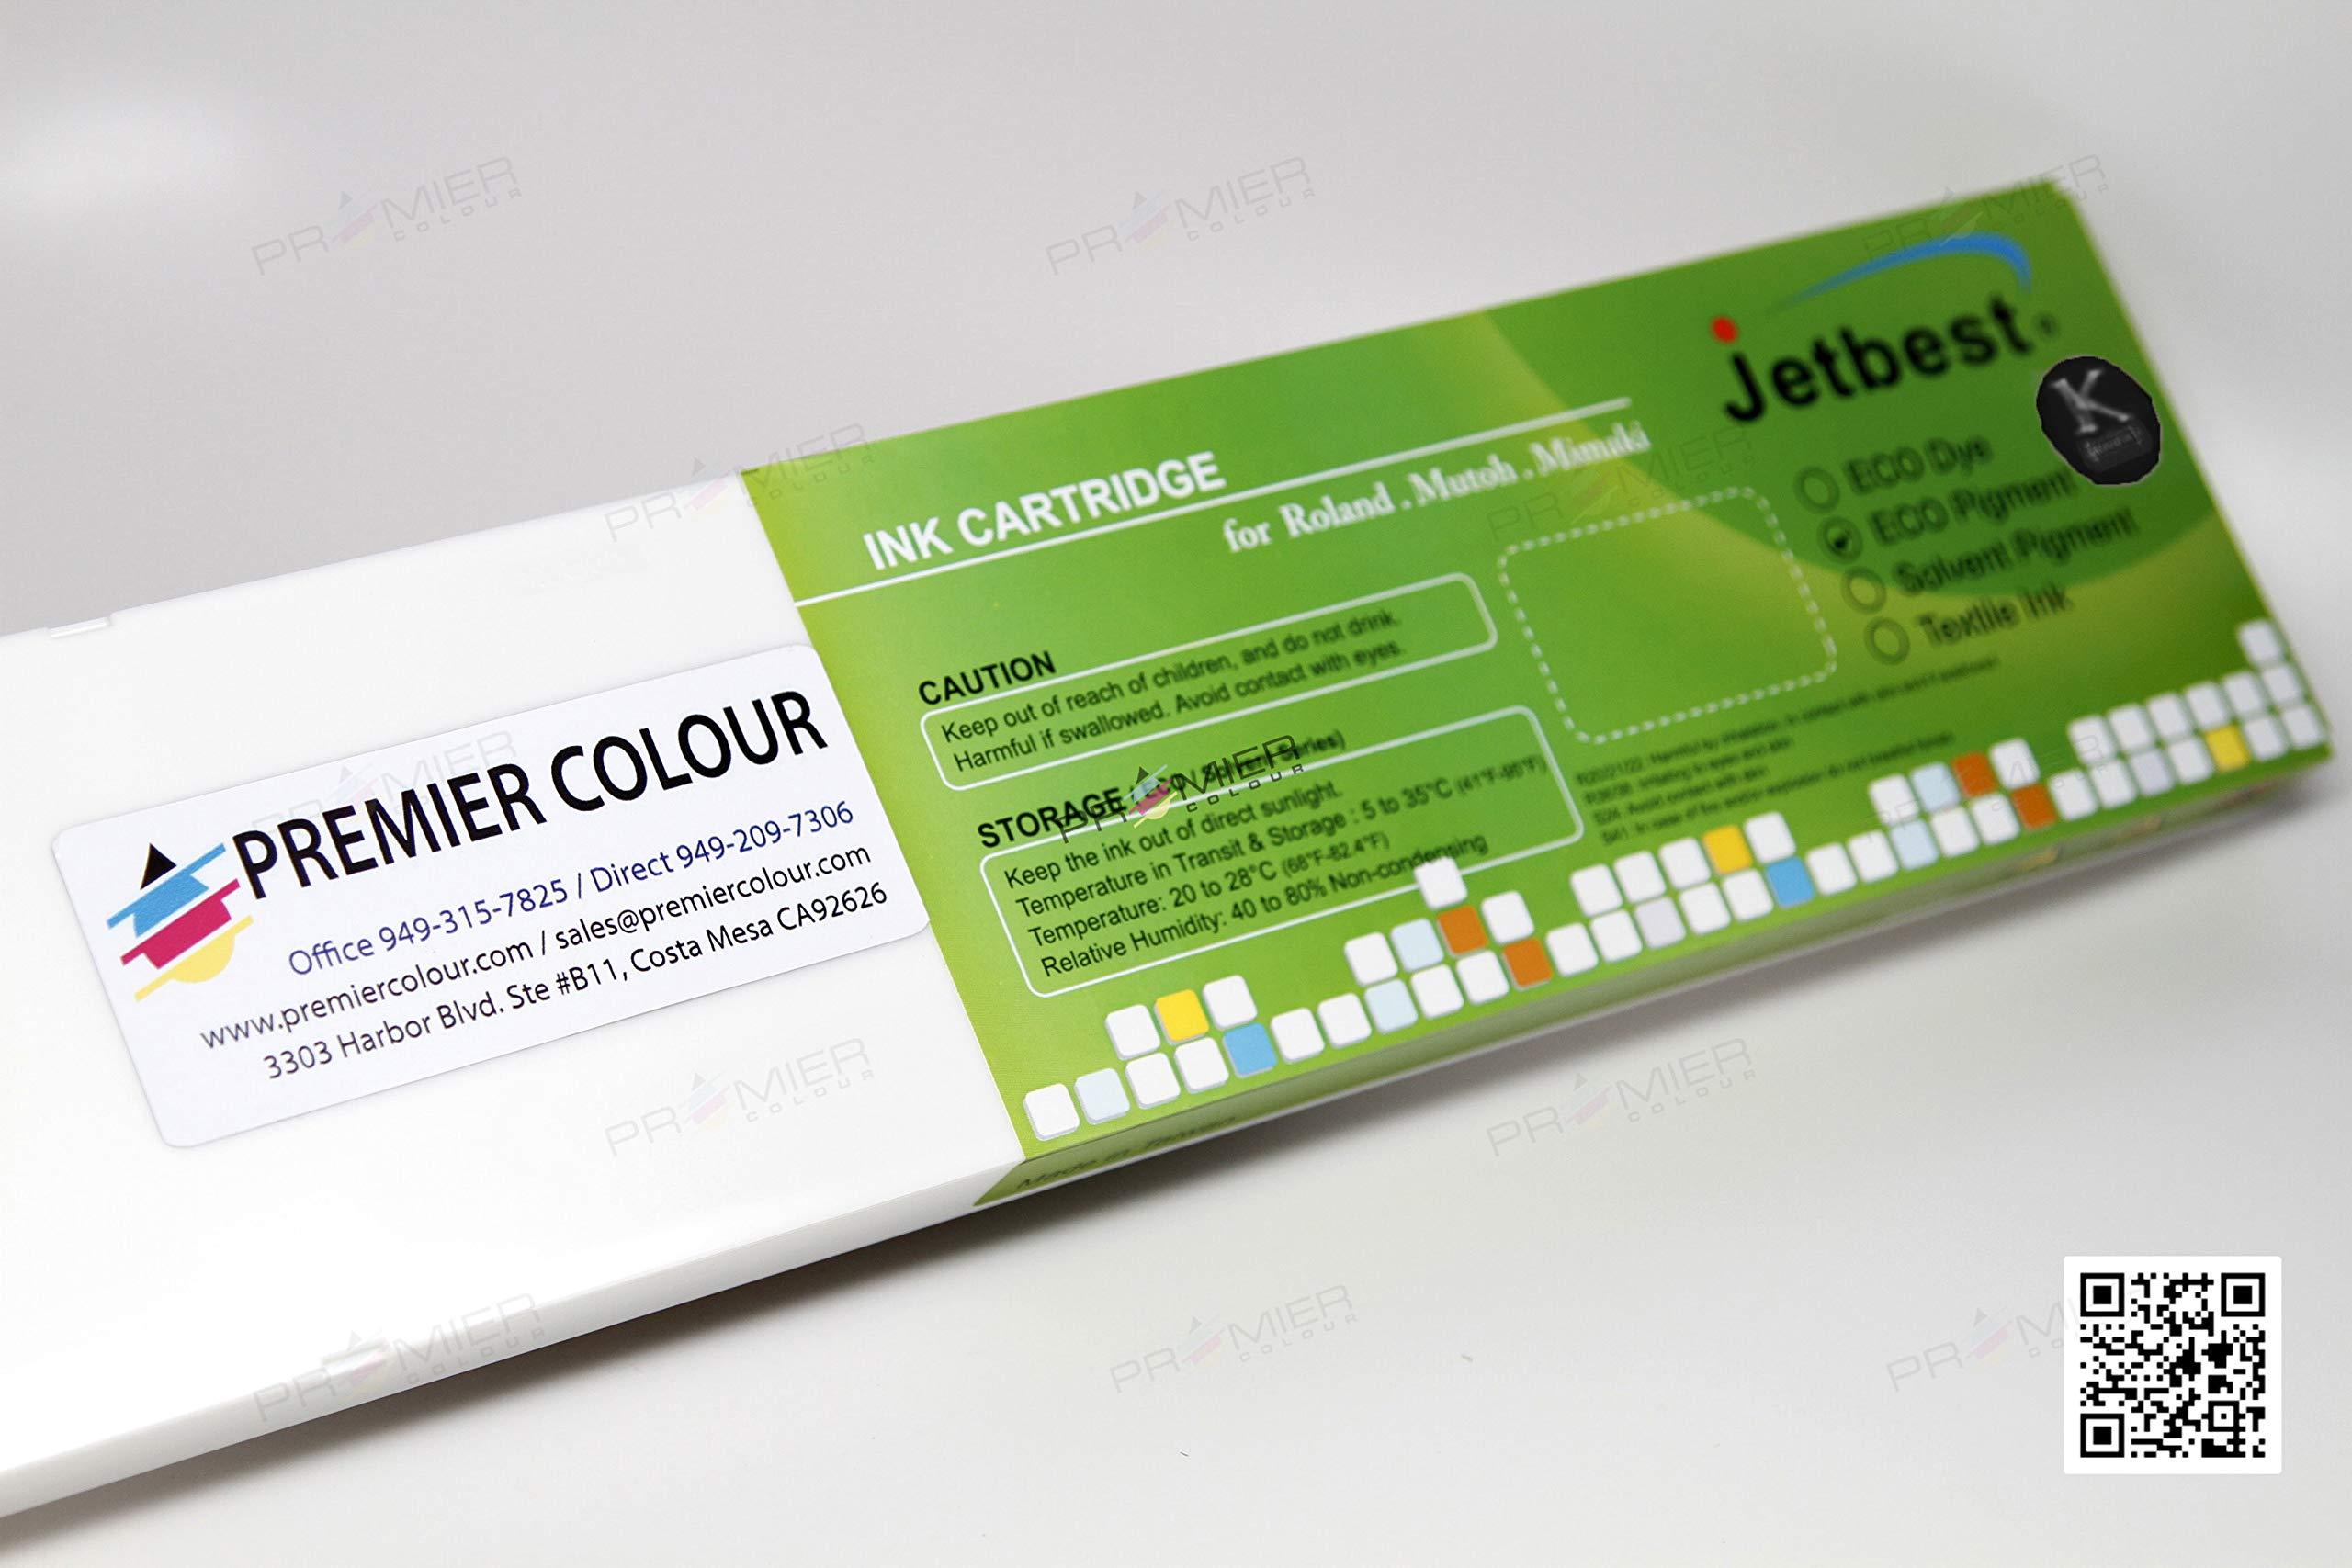 JETBEST ES3, 440mL Eco Solvent Ink Cartridge, for MIMAKI ES3 (Black)